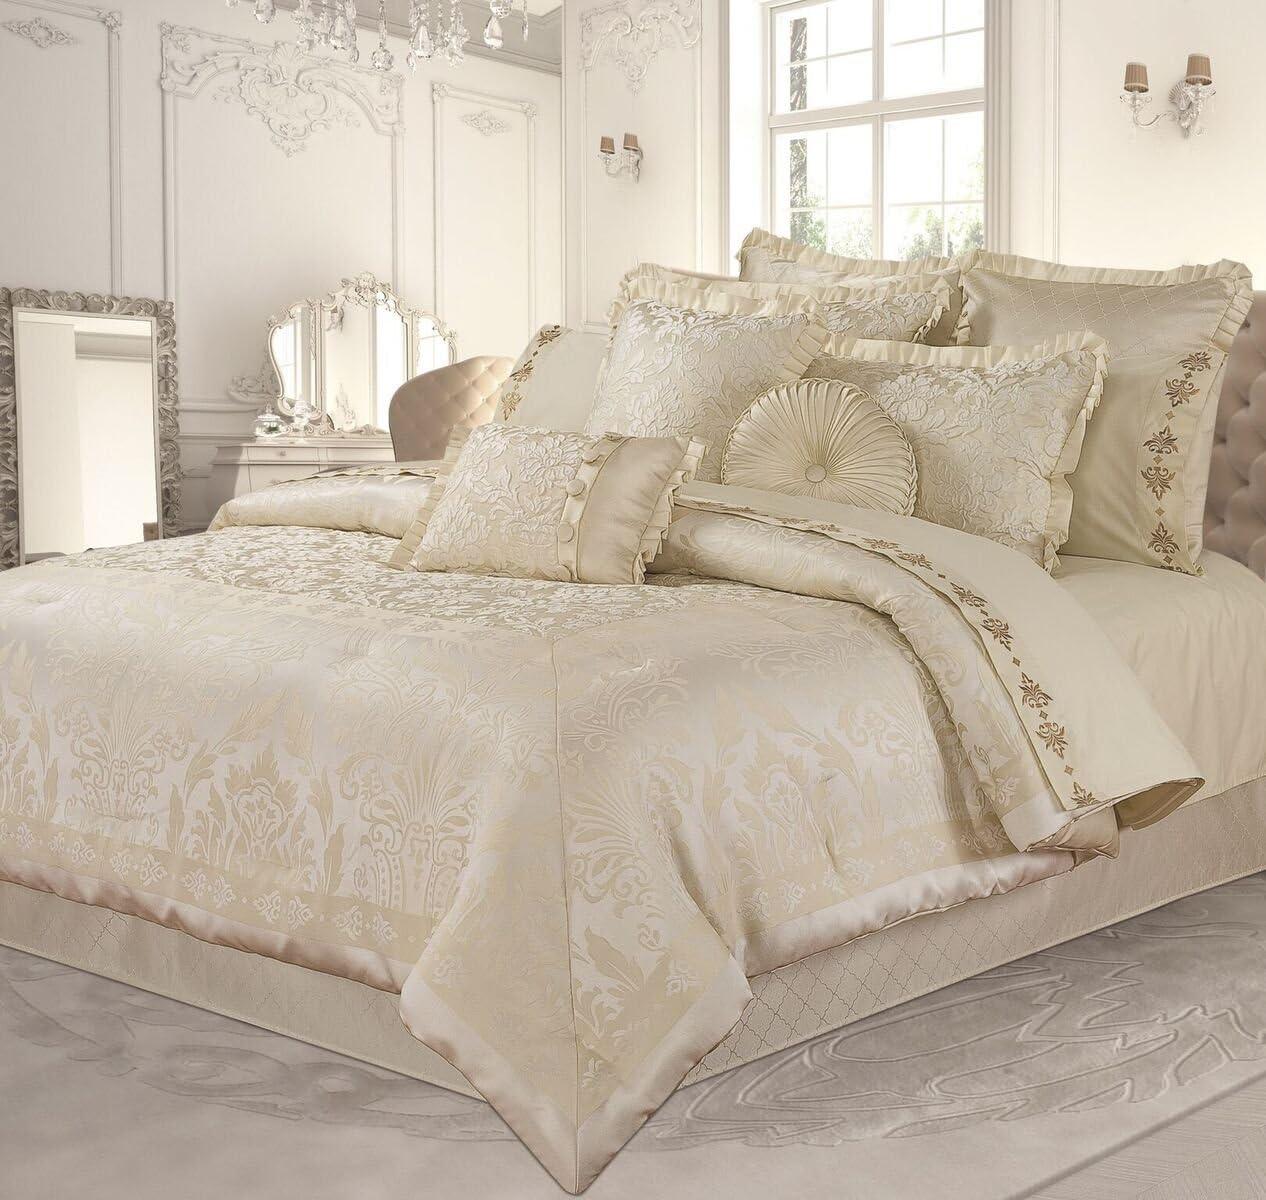 New Season Home Athena Comforter Set Queen Cream 6 Piece Amazon Ca Home Kitchen